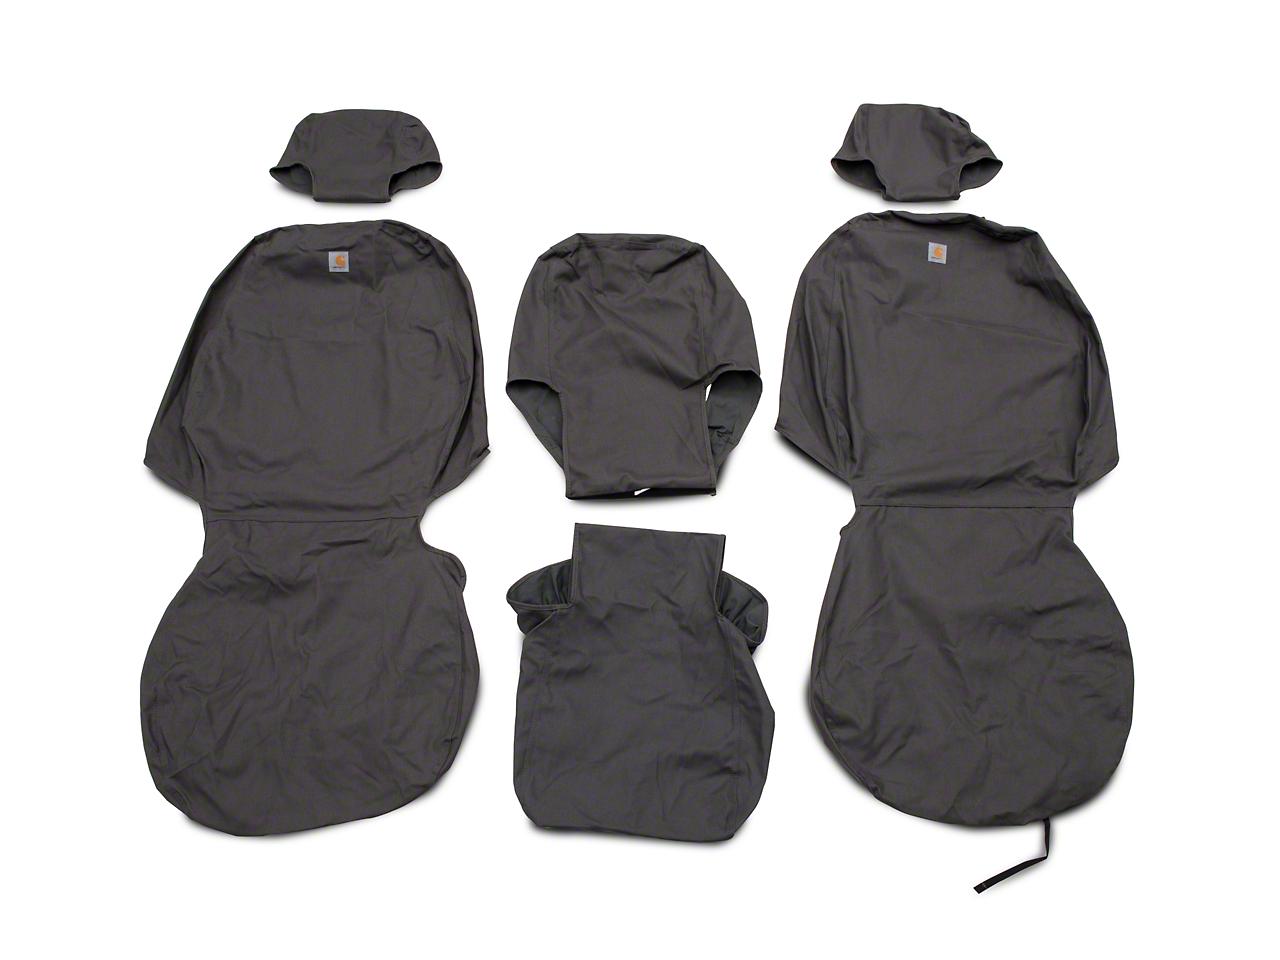 Covercraft Carhartt Seat Saver Front Seat Covers - Gravel (07-13 Silverado 1500 w/ Bench Seat)